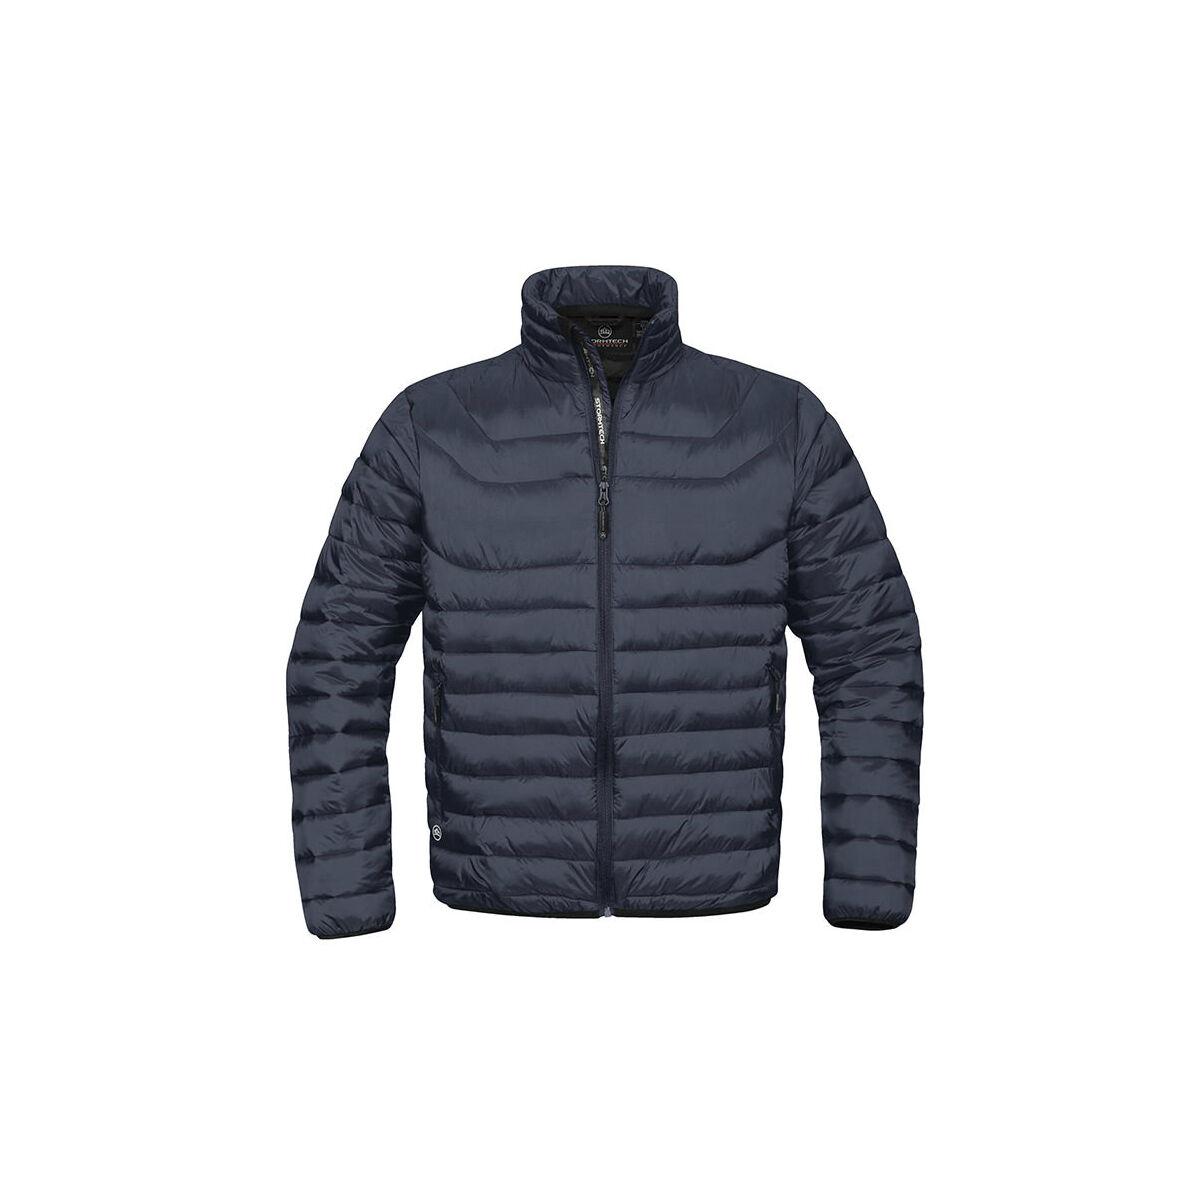 Stormtech Mens Altitude Jacket